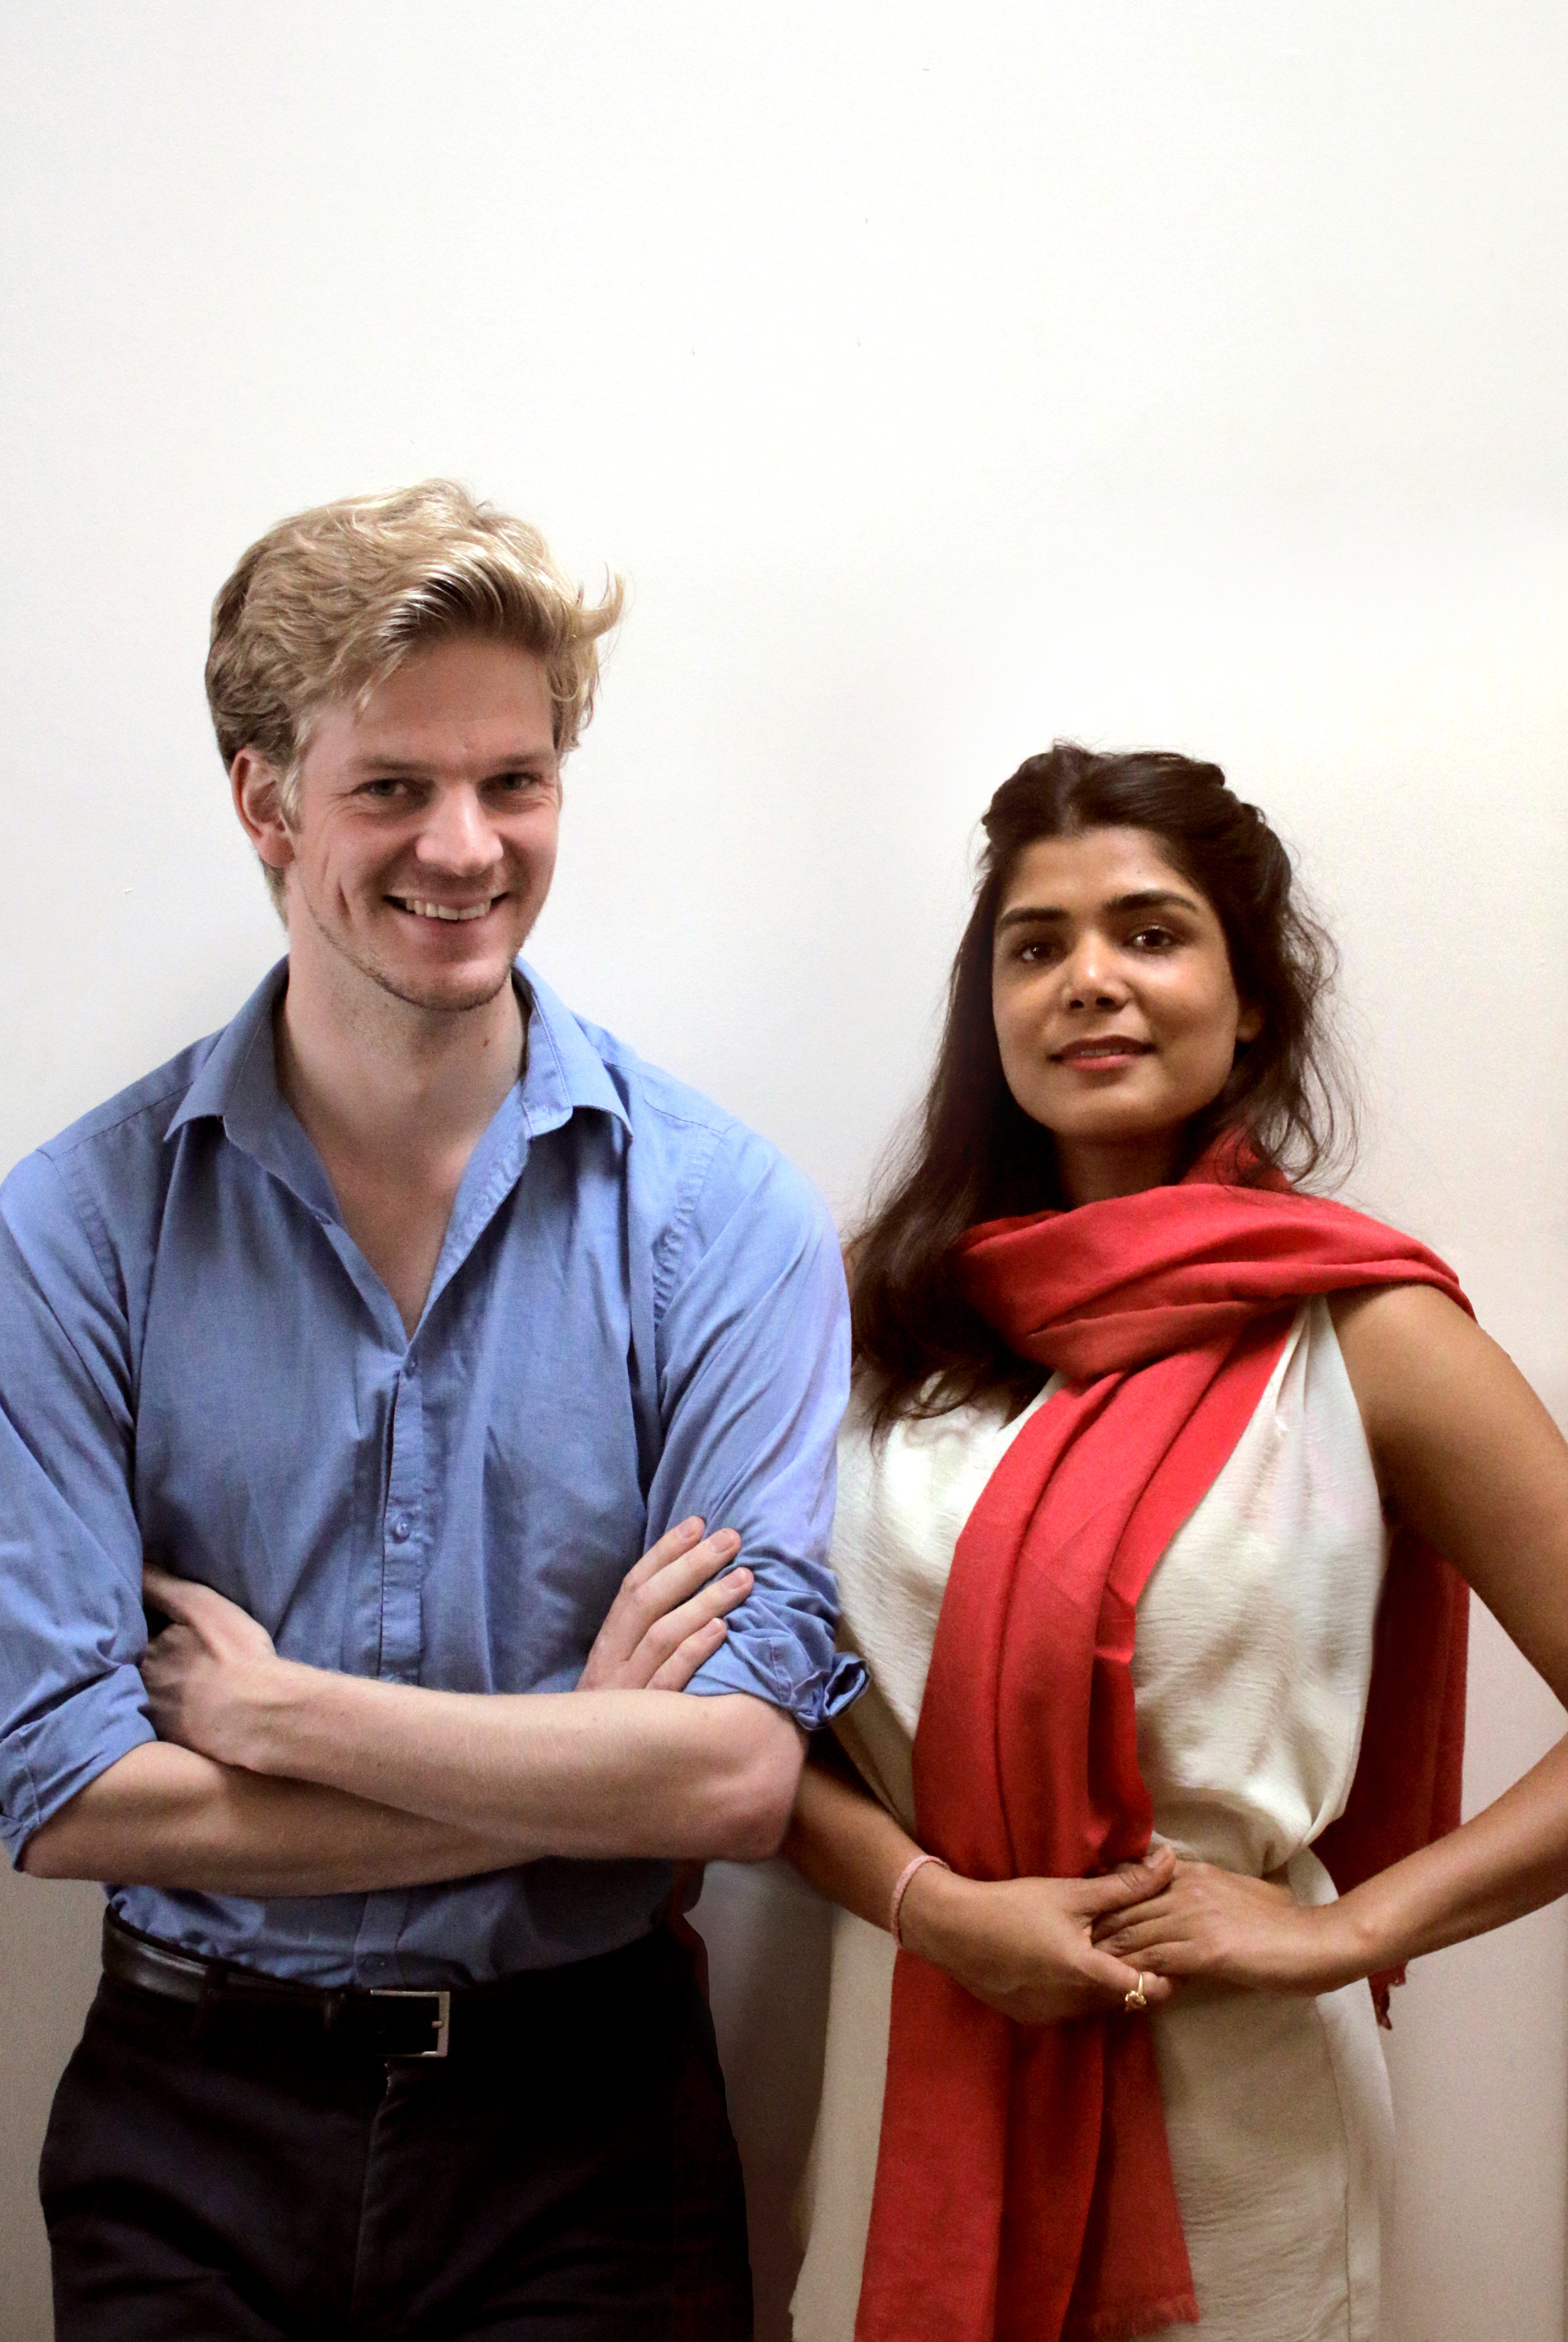 TO&FROM founders: Bob de Graaf & Somya Singh